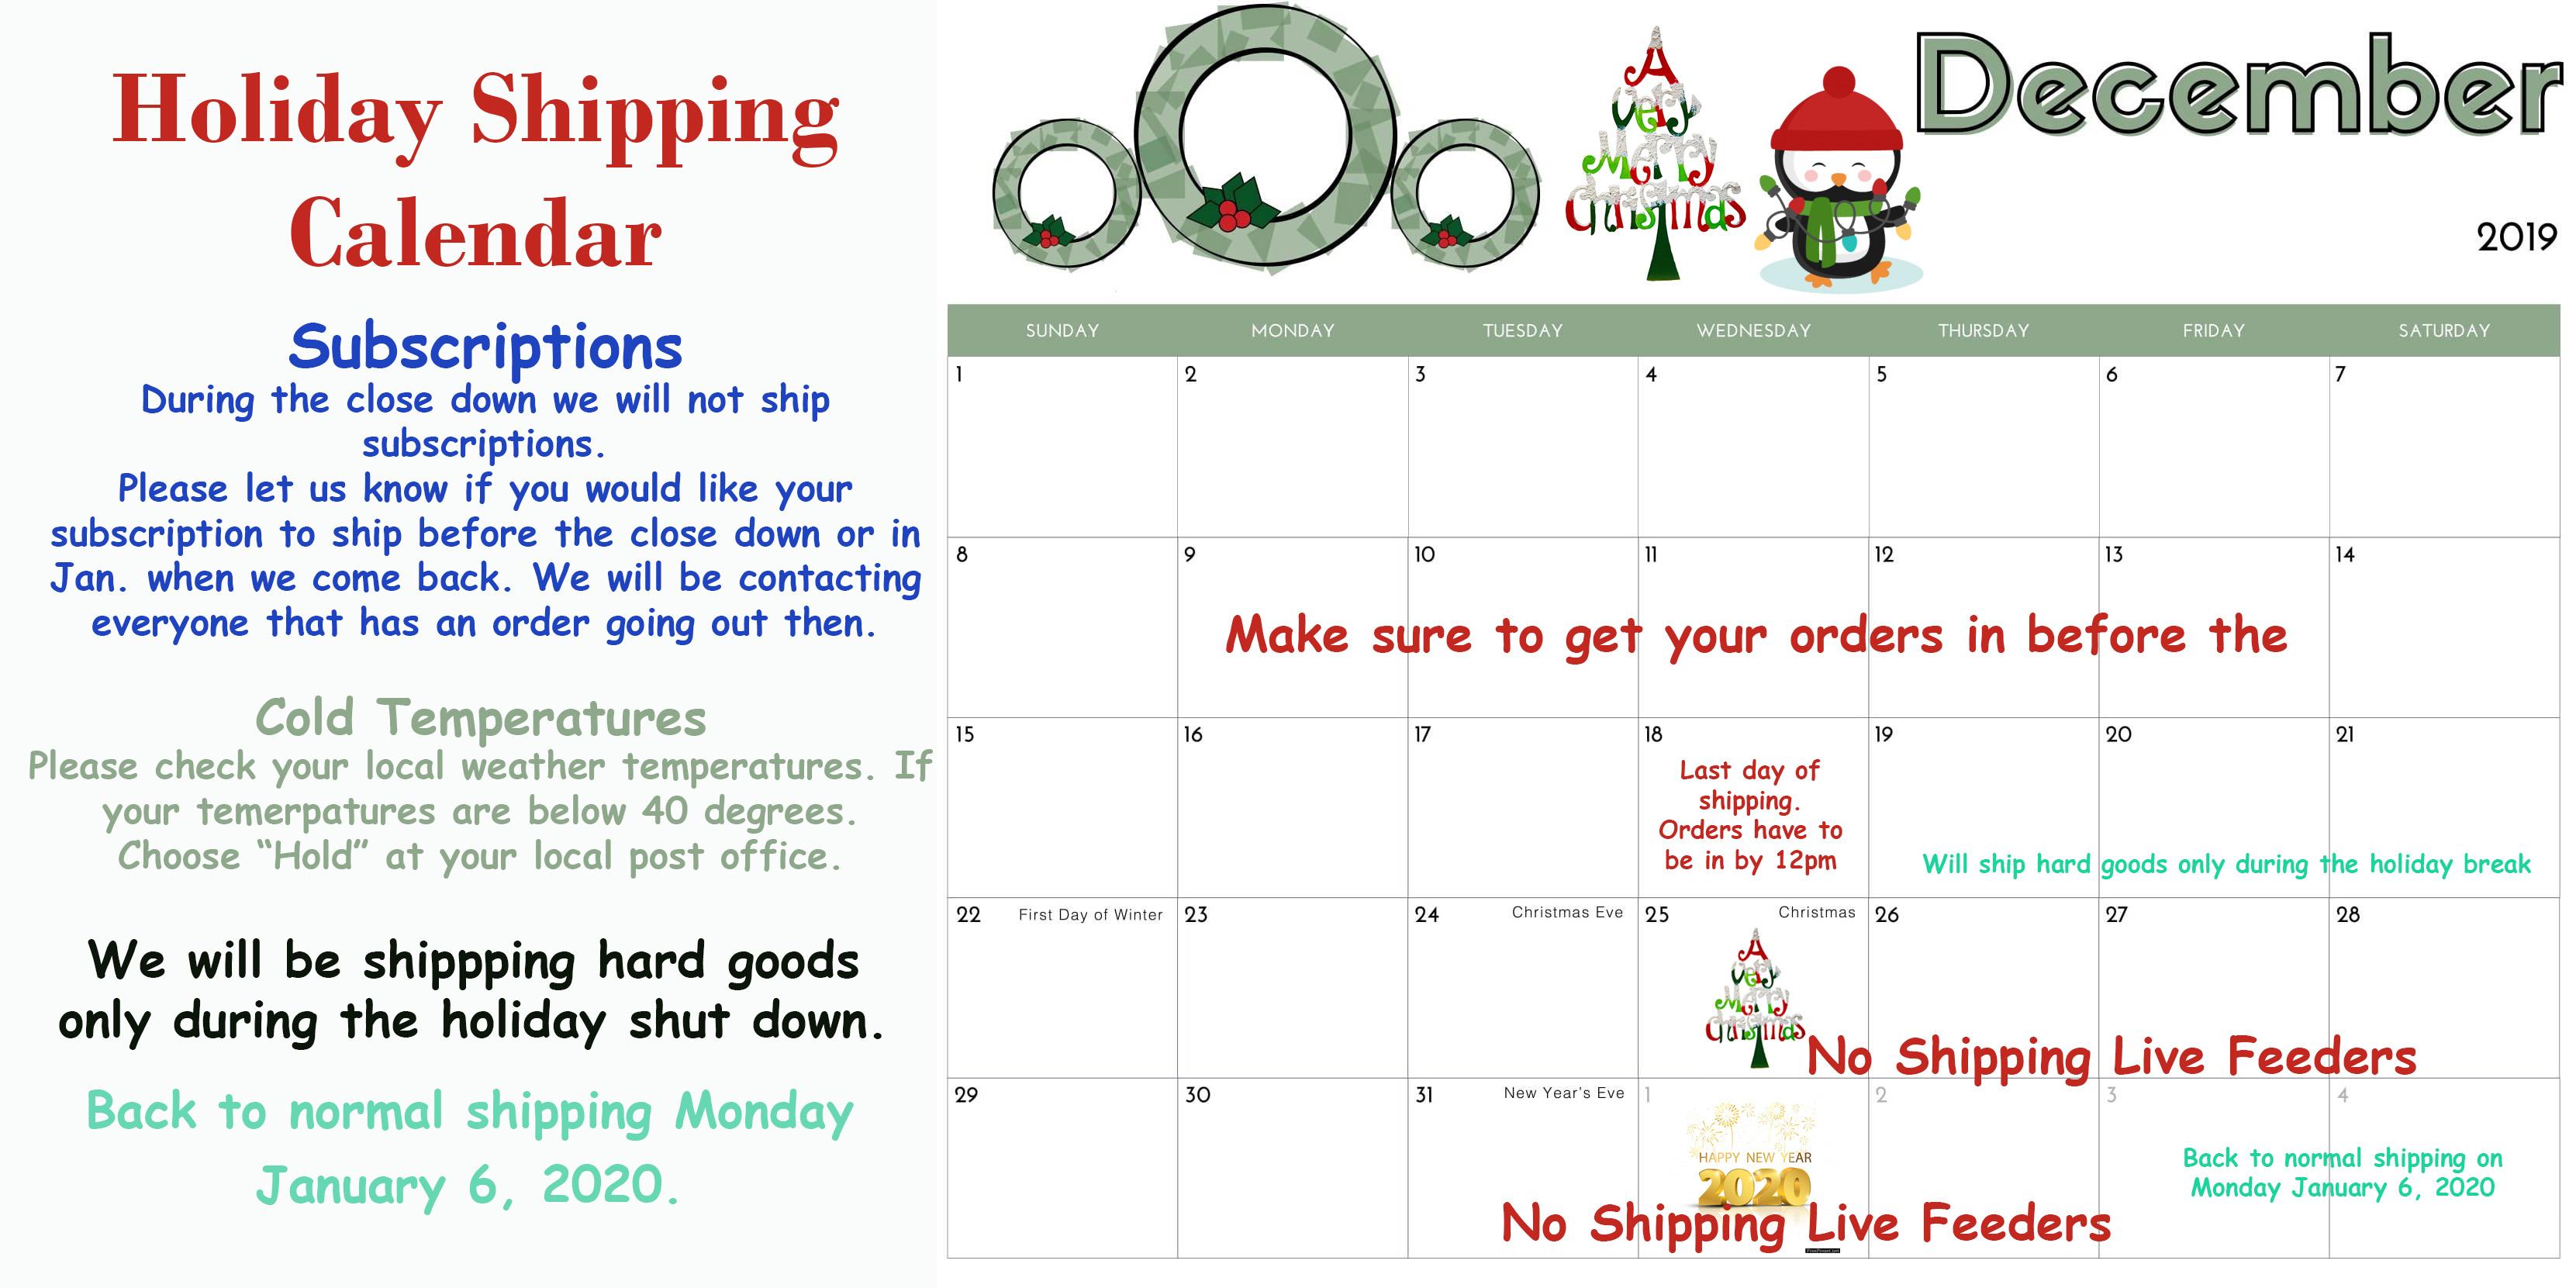 holiday-shipping-2019-slideshow-11.13.19.jpg